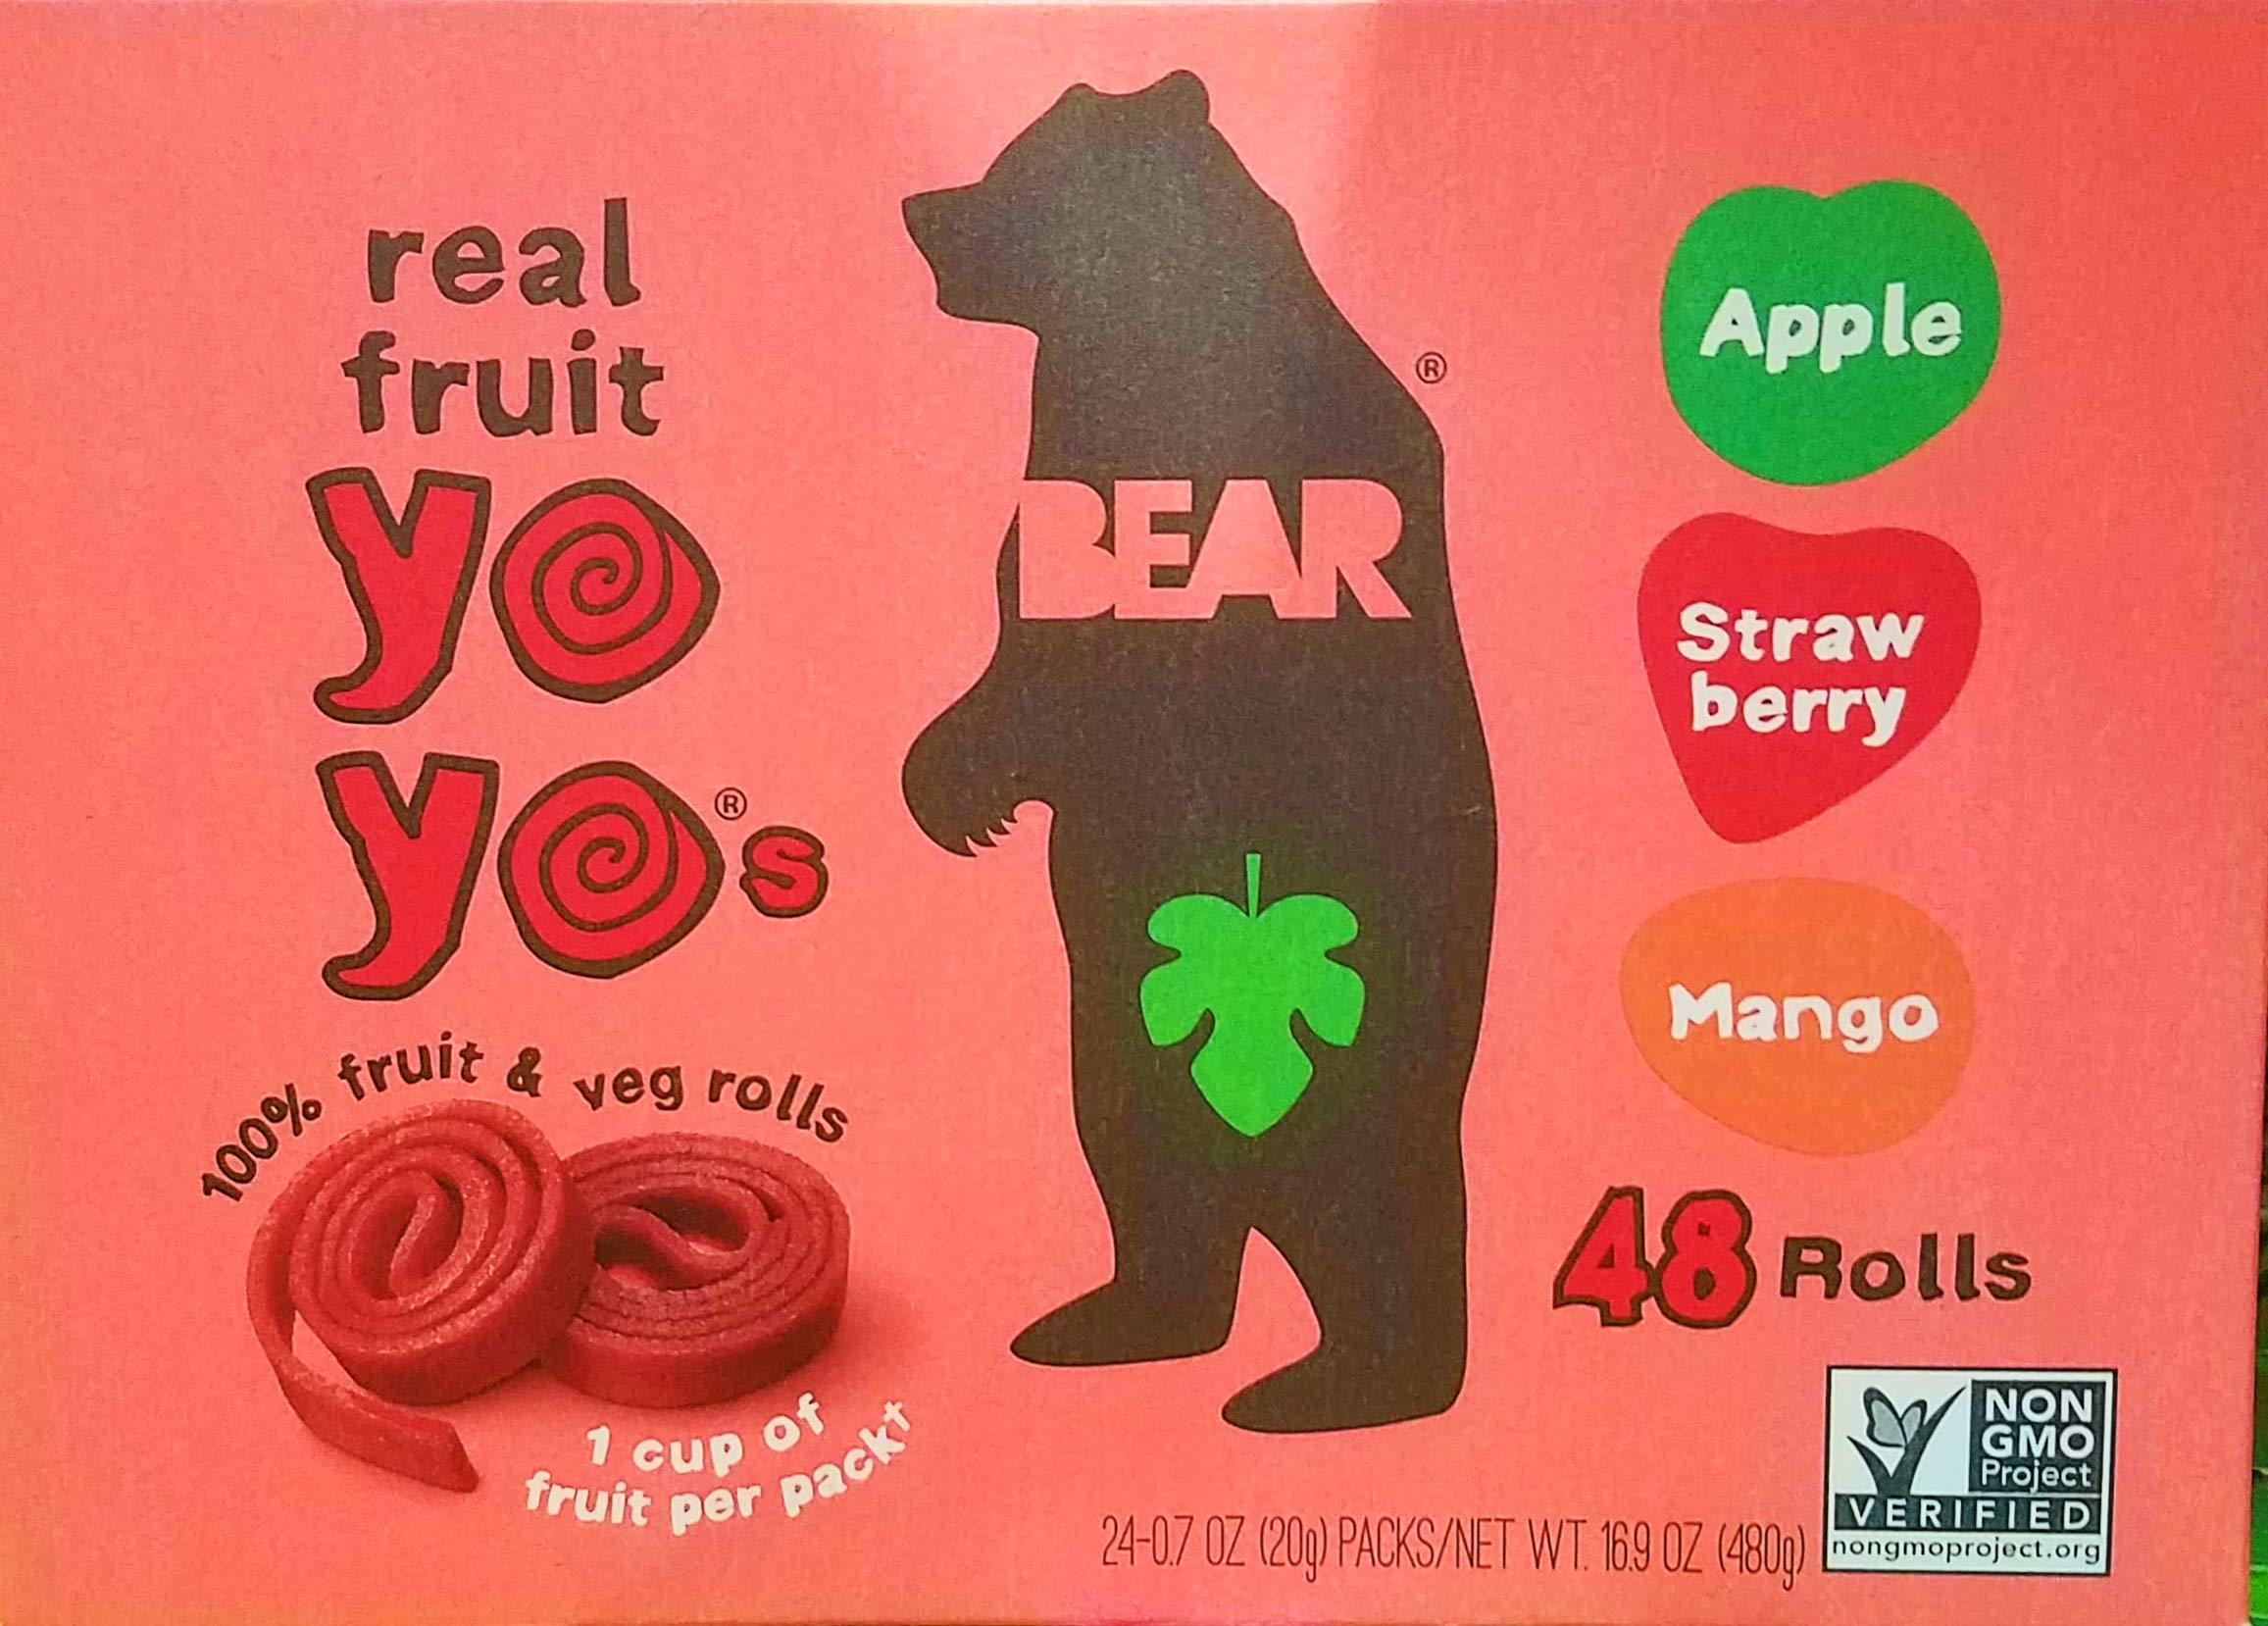 Bear Yoyos Real Fruit Rolls Snacks Leather Variety Pack: Apple, Strawberry, Mango, 24-0.7 oz Count by Bear Yoyos